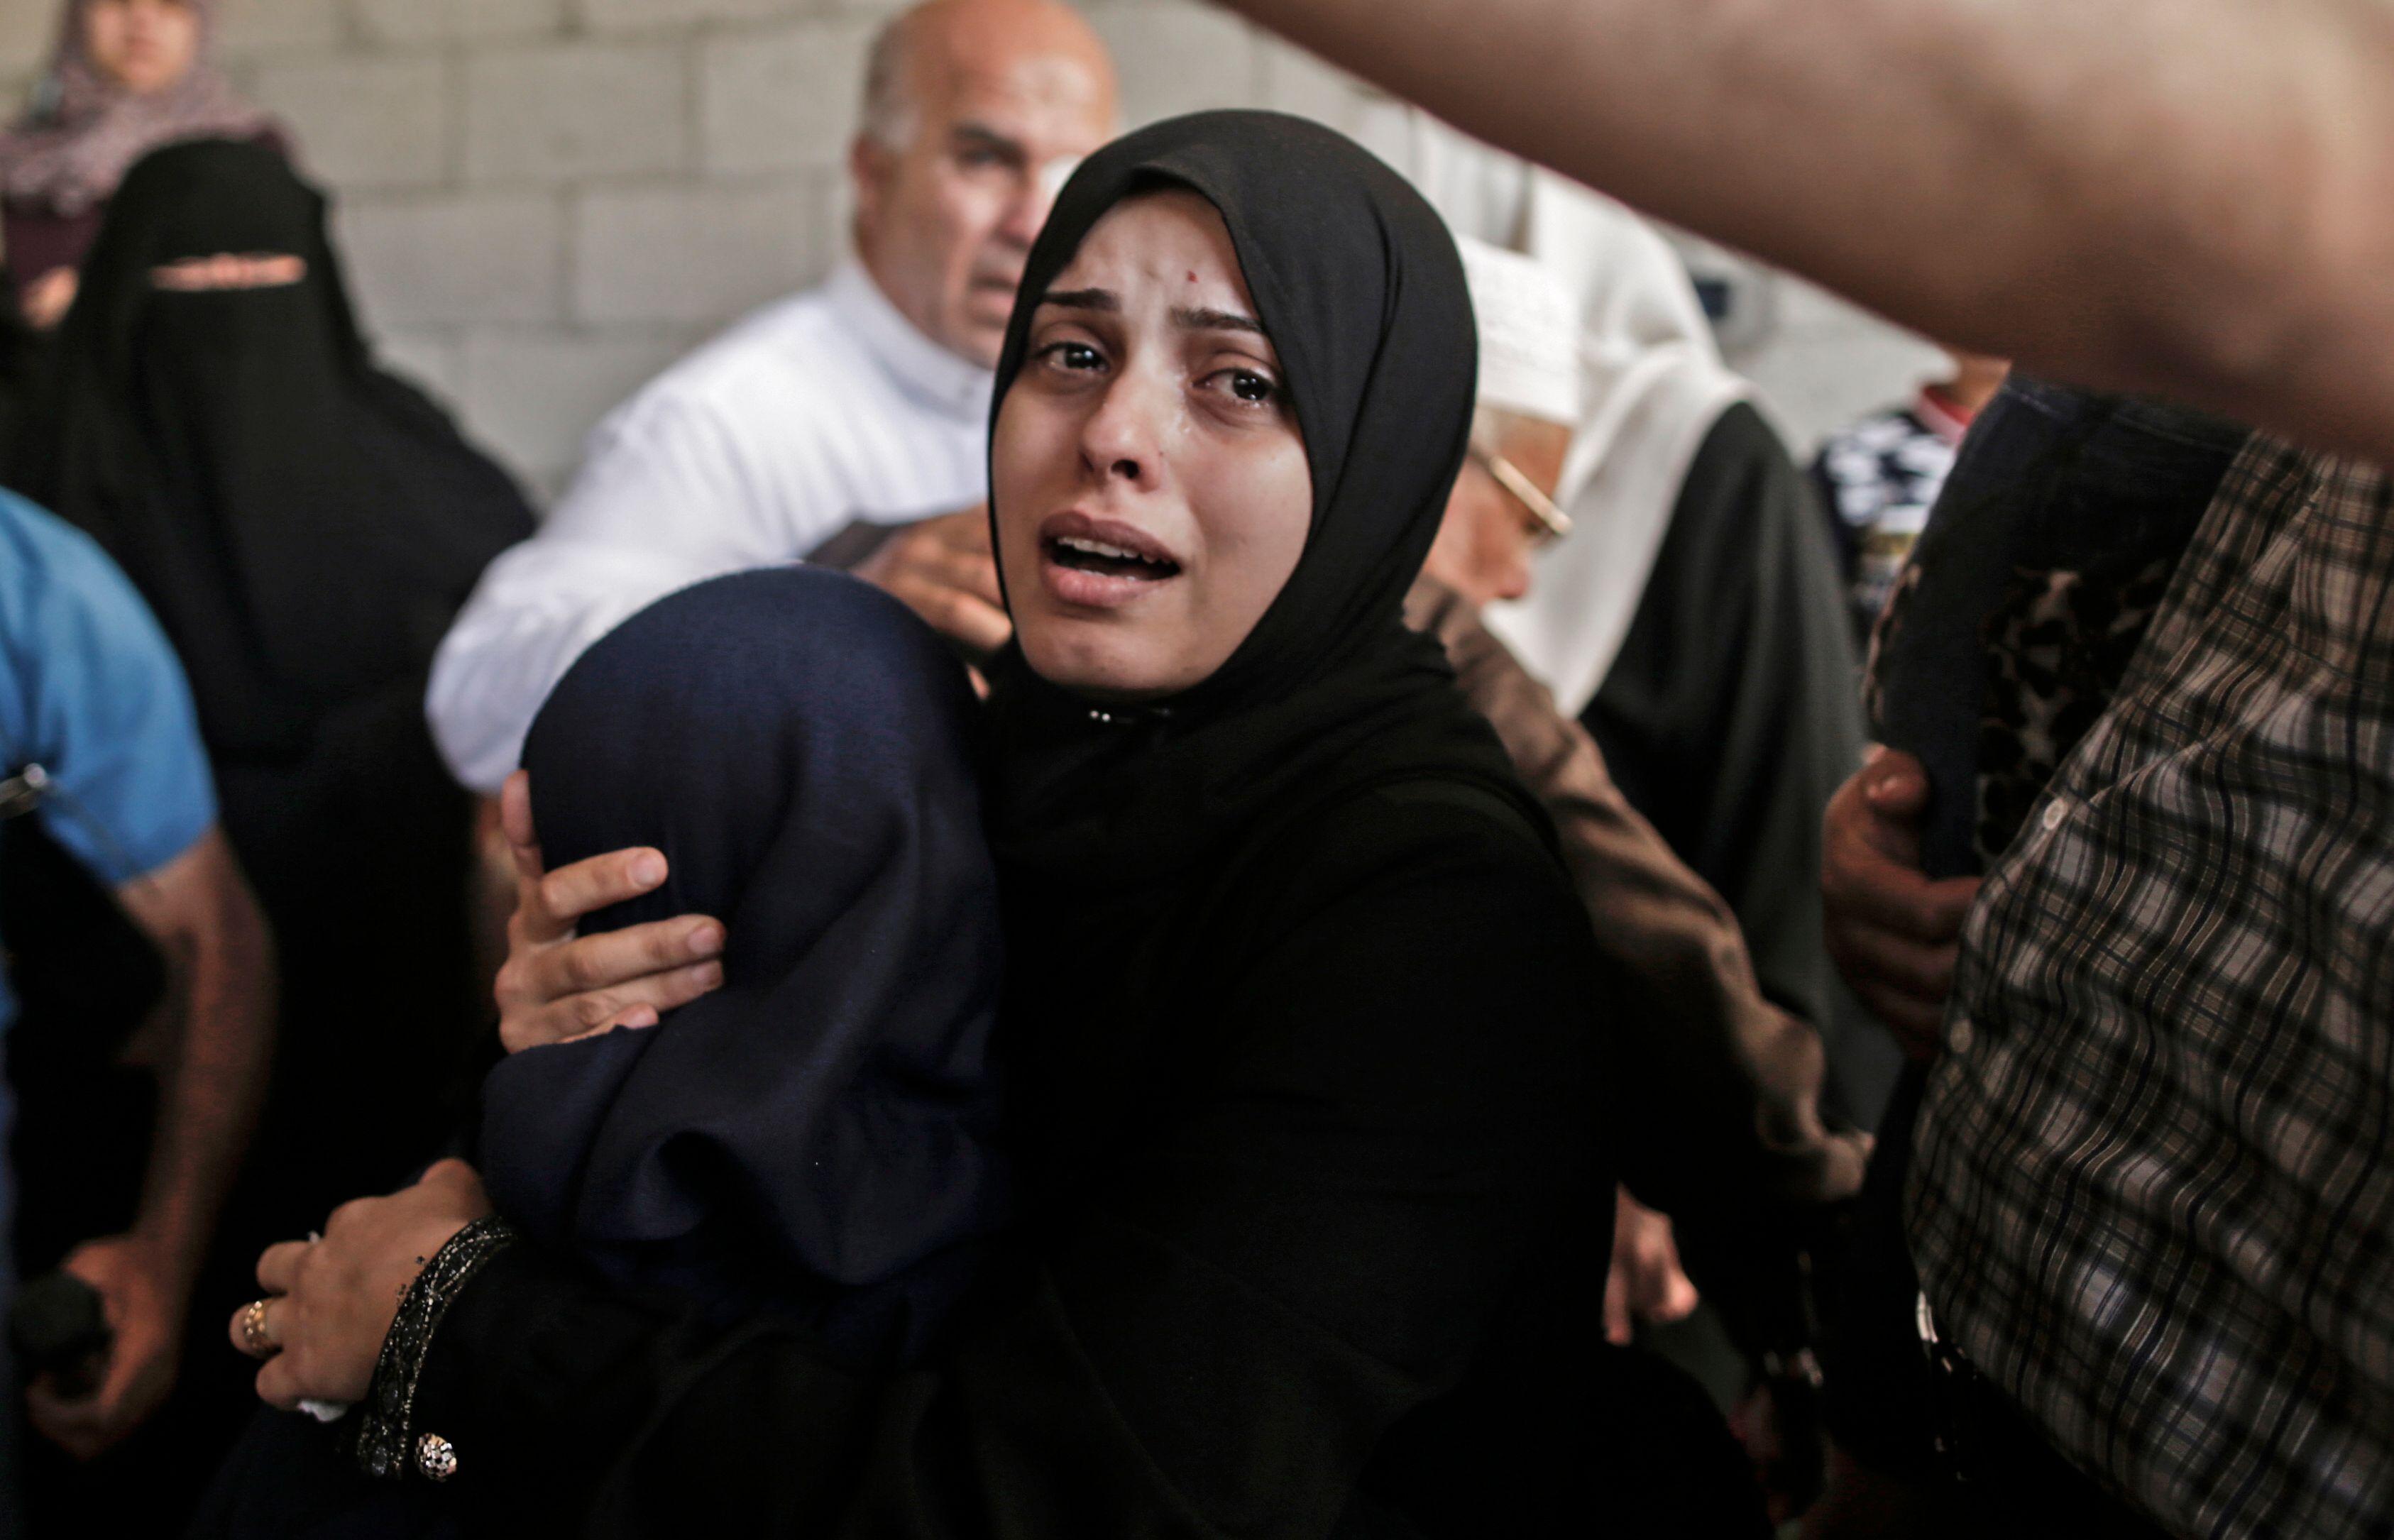 تشييع جثمان الشهيد ناصر غراب  (3)